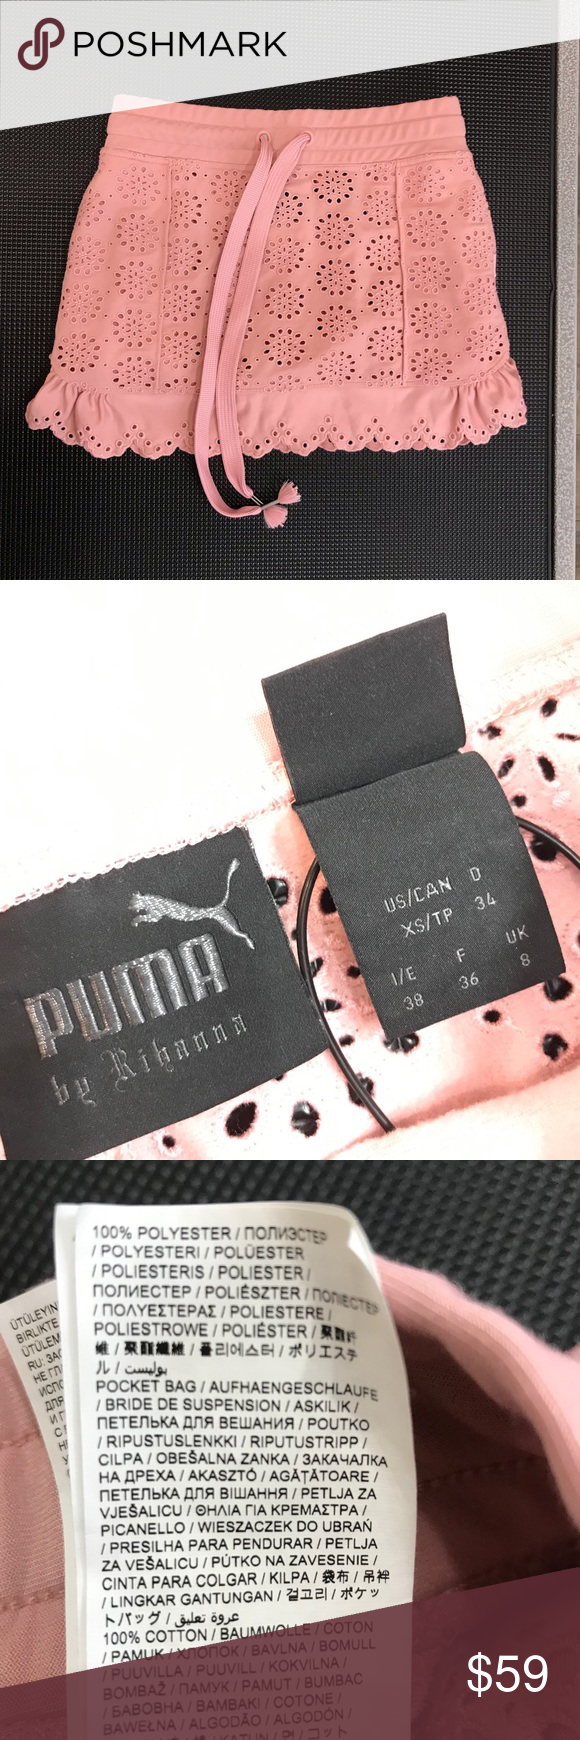 Rihanna Skirt   Rose brand, Fenty, Rihanna